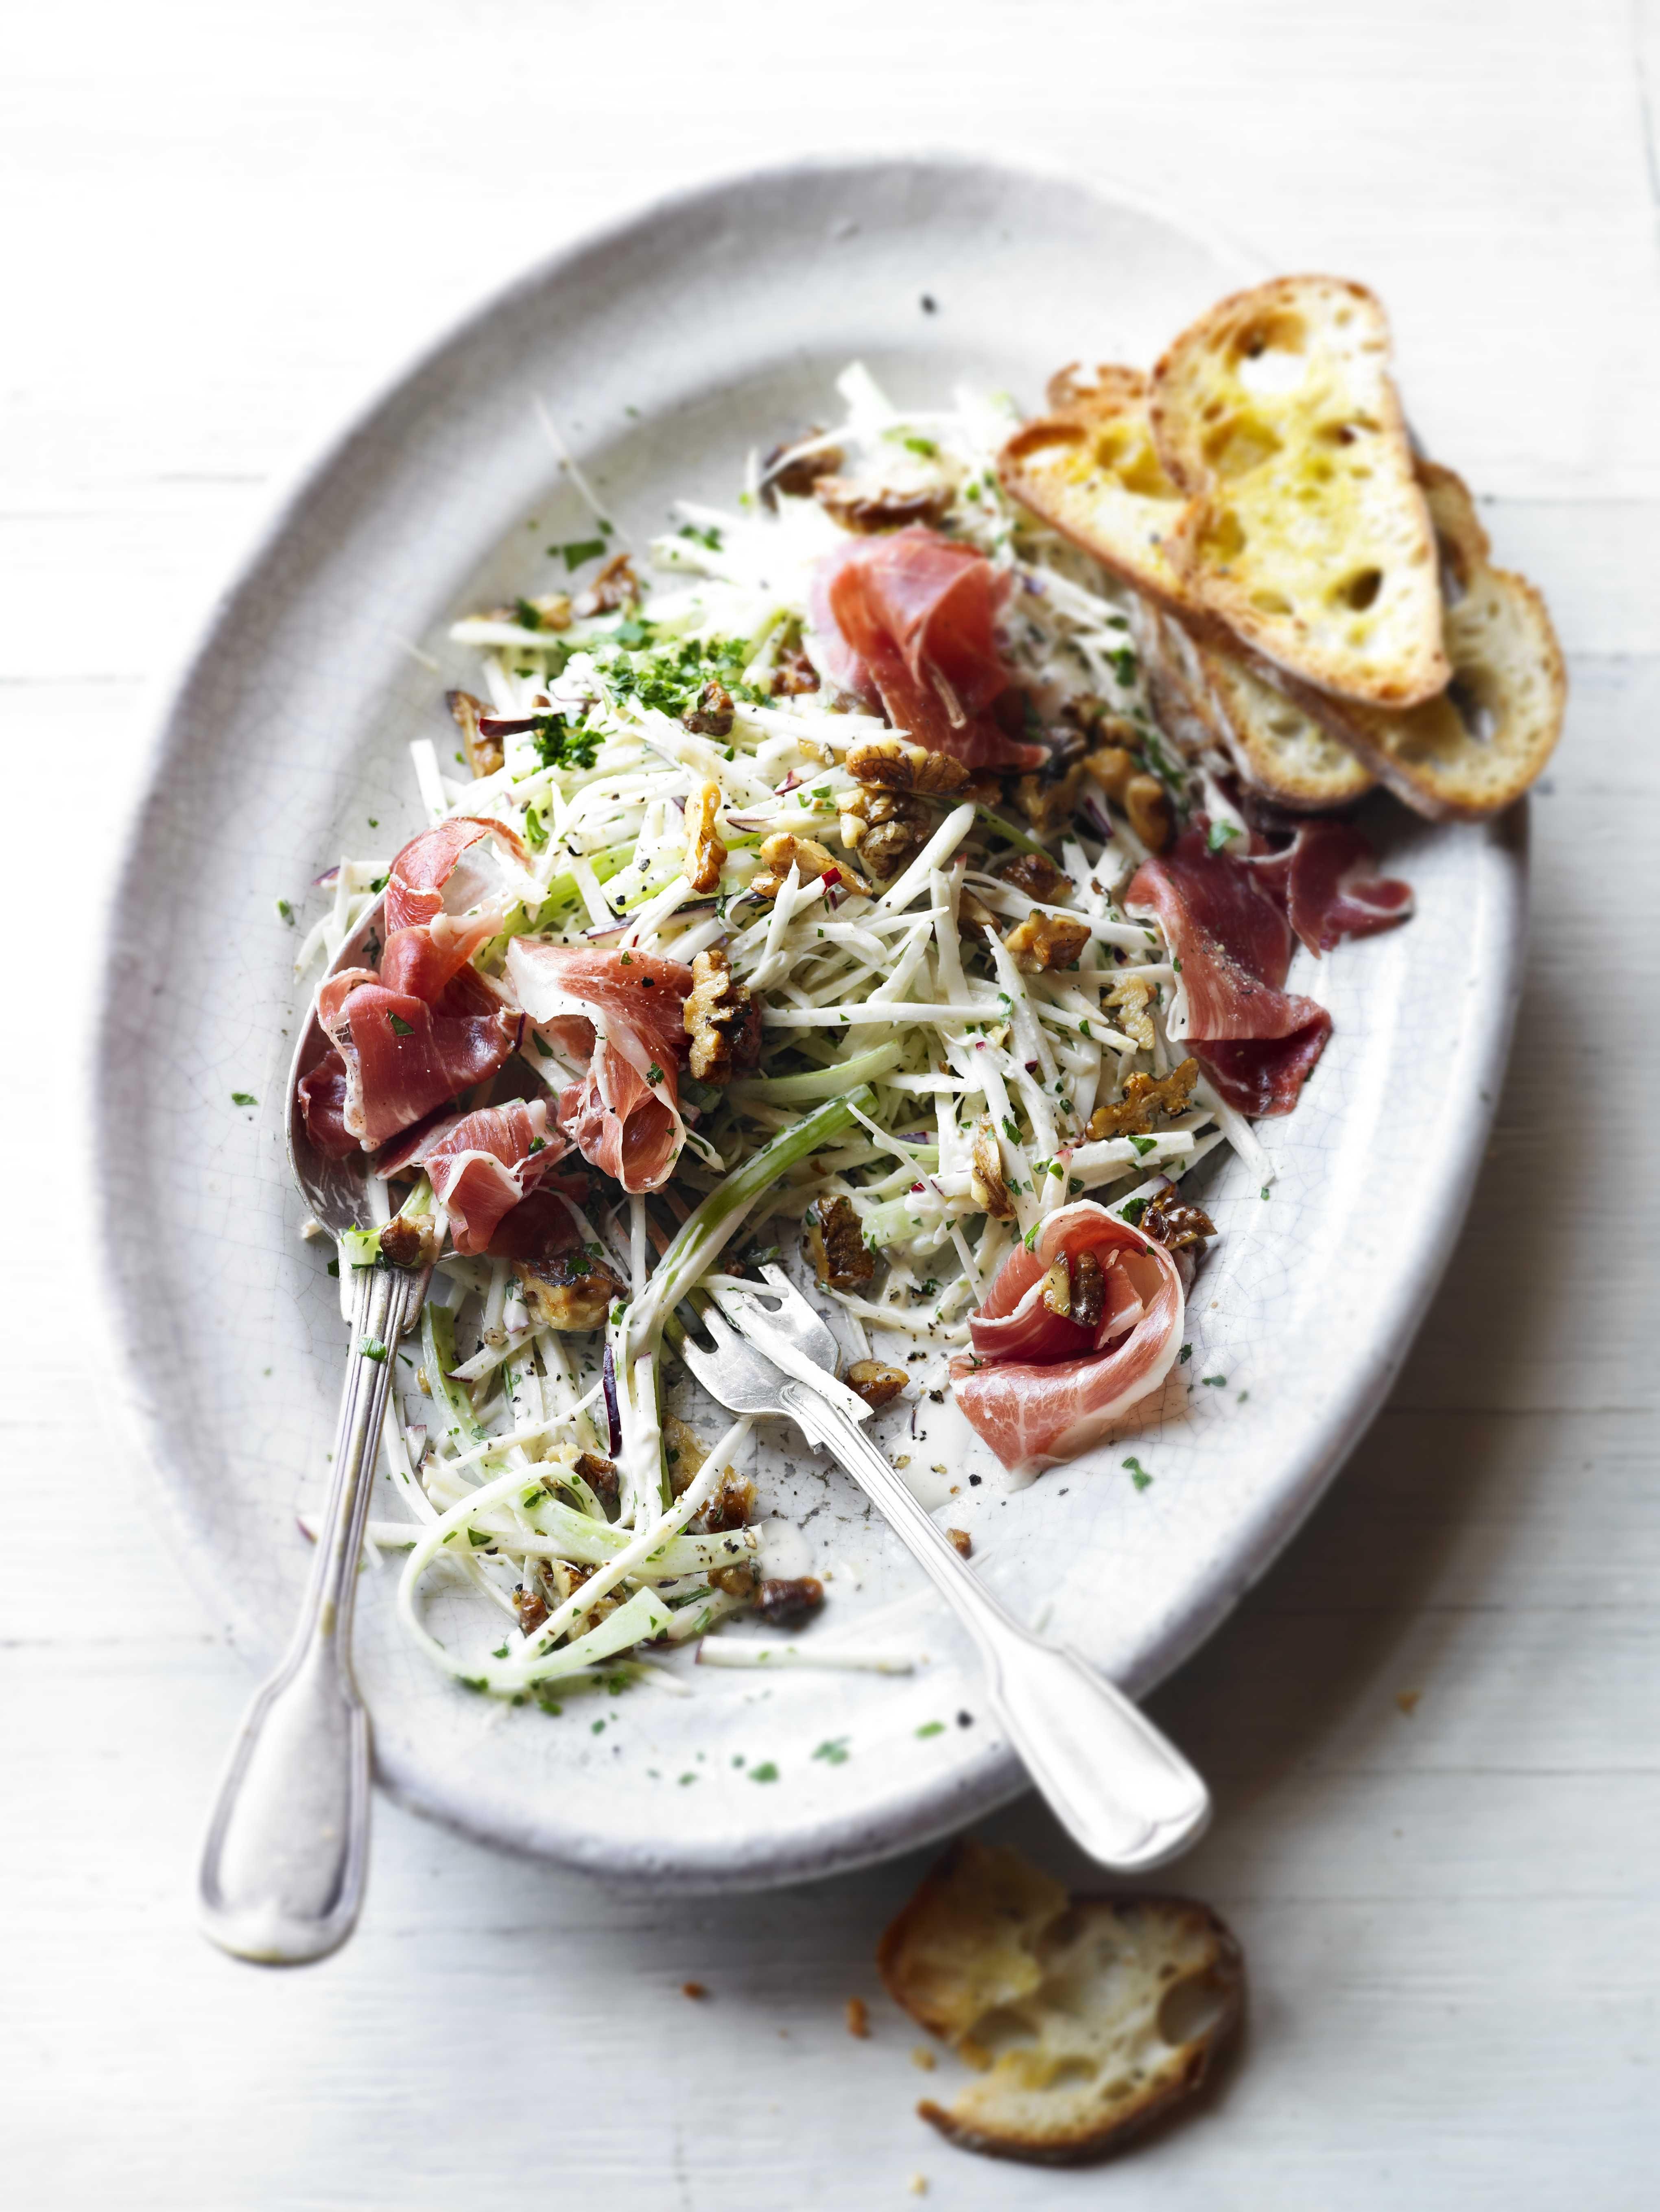 Celeriac, apple and walnut salad with prosciutto